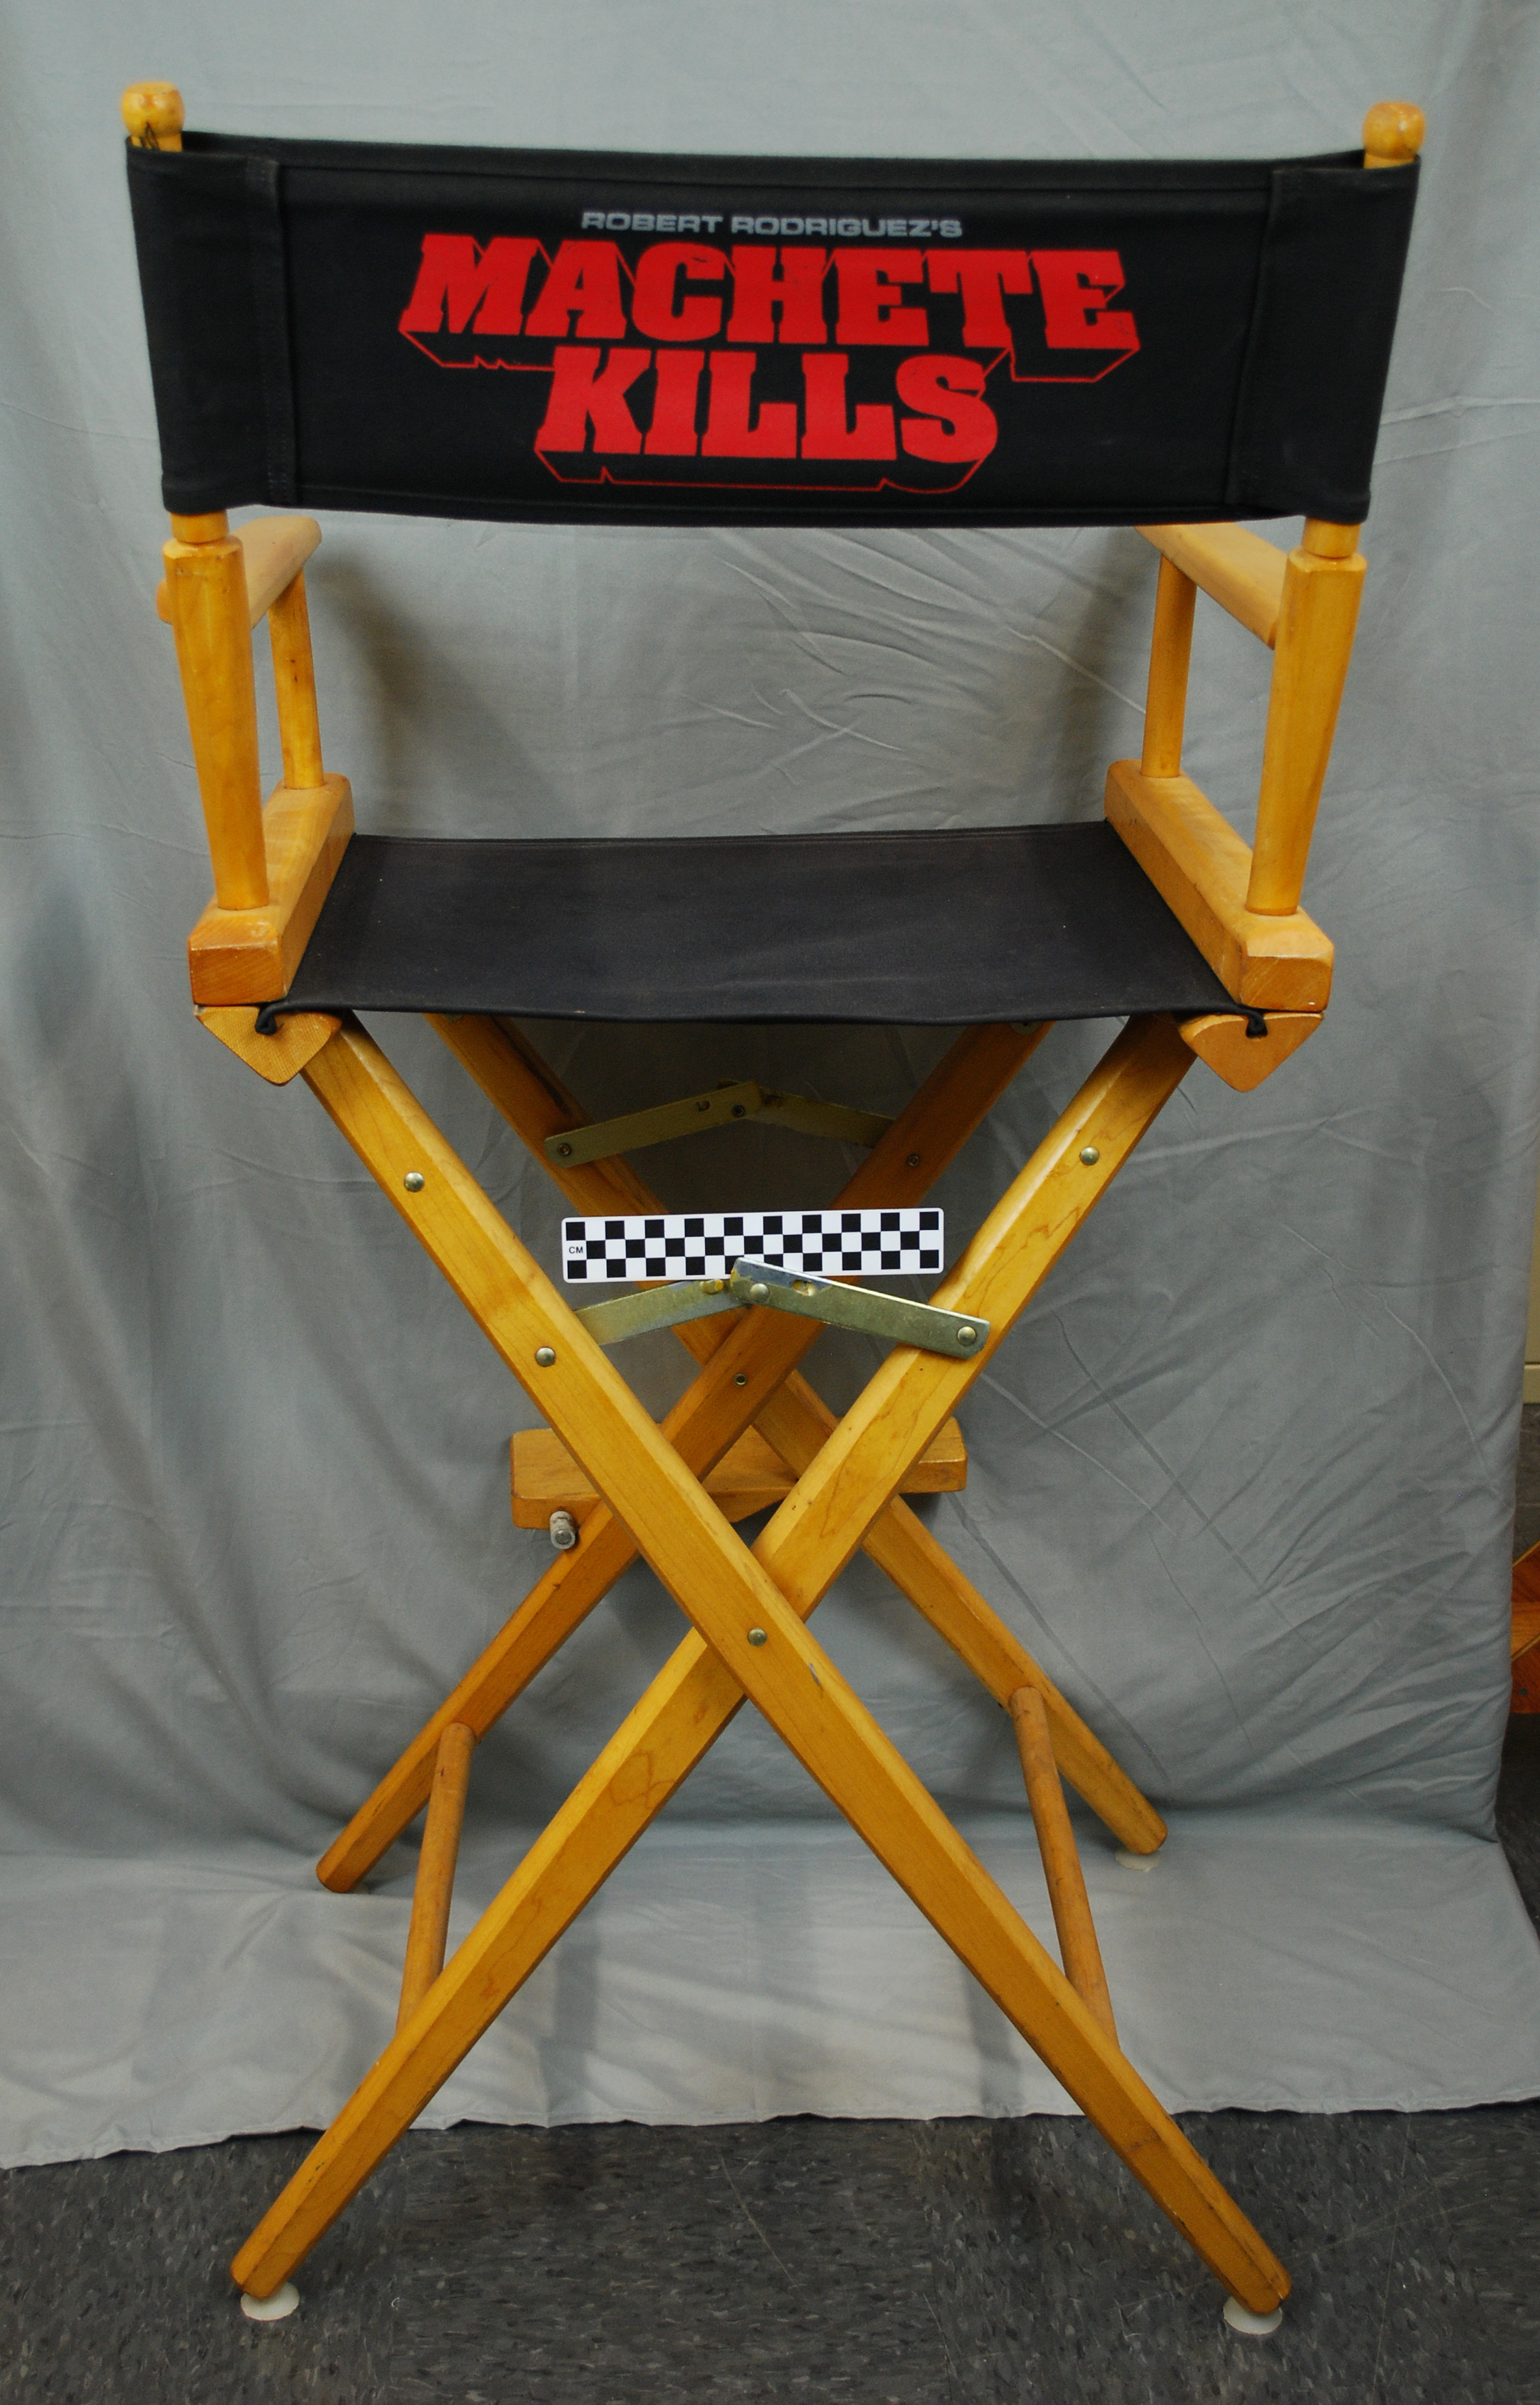 Object Blog: Director's Chair (Machete Kills) | UTSA Institute Of Texan Cultures